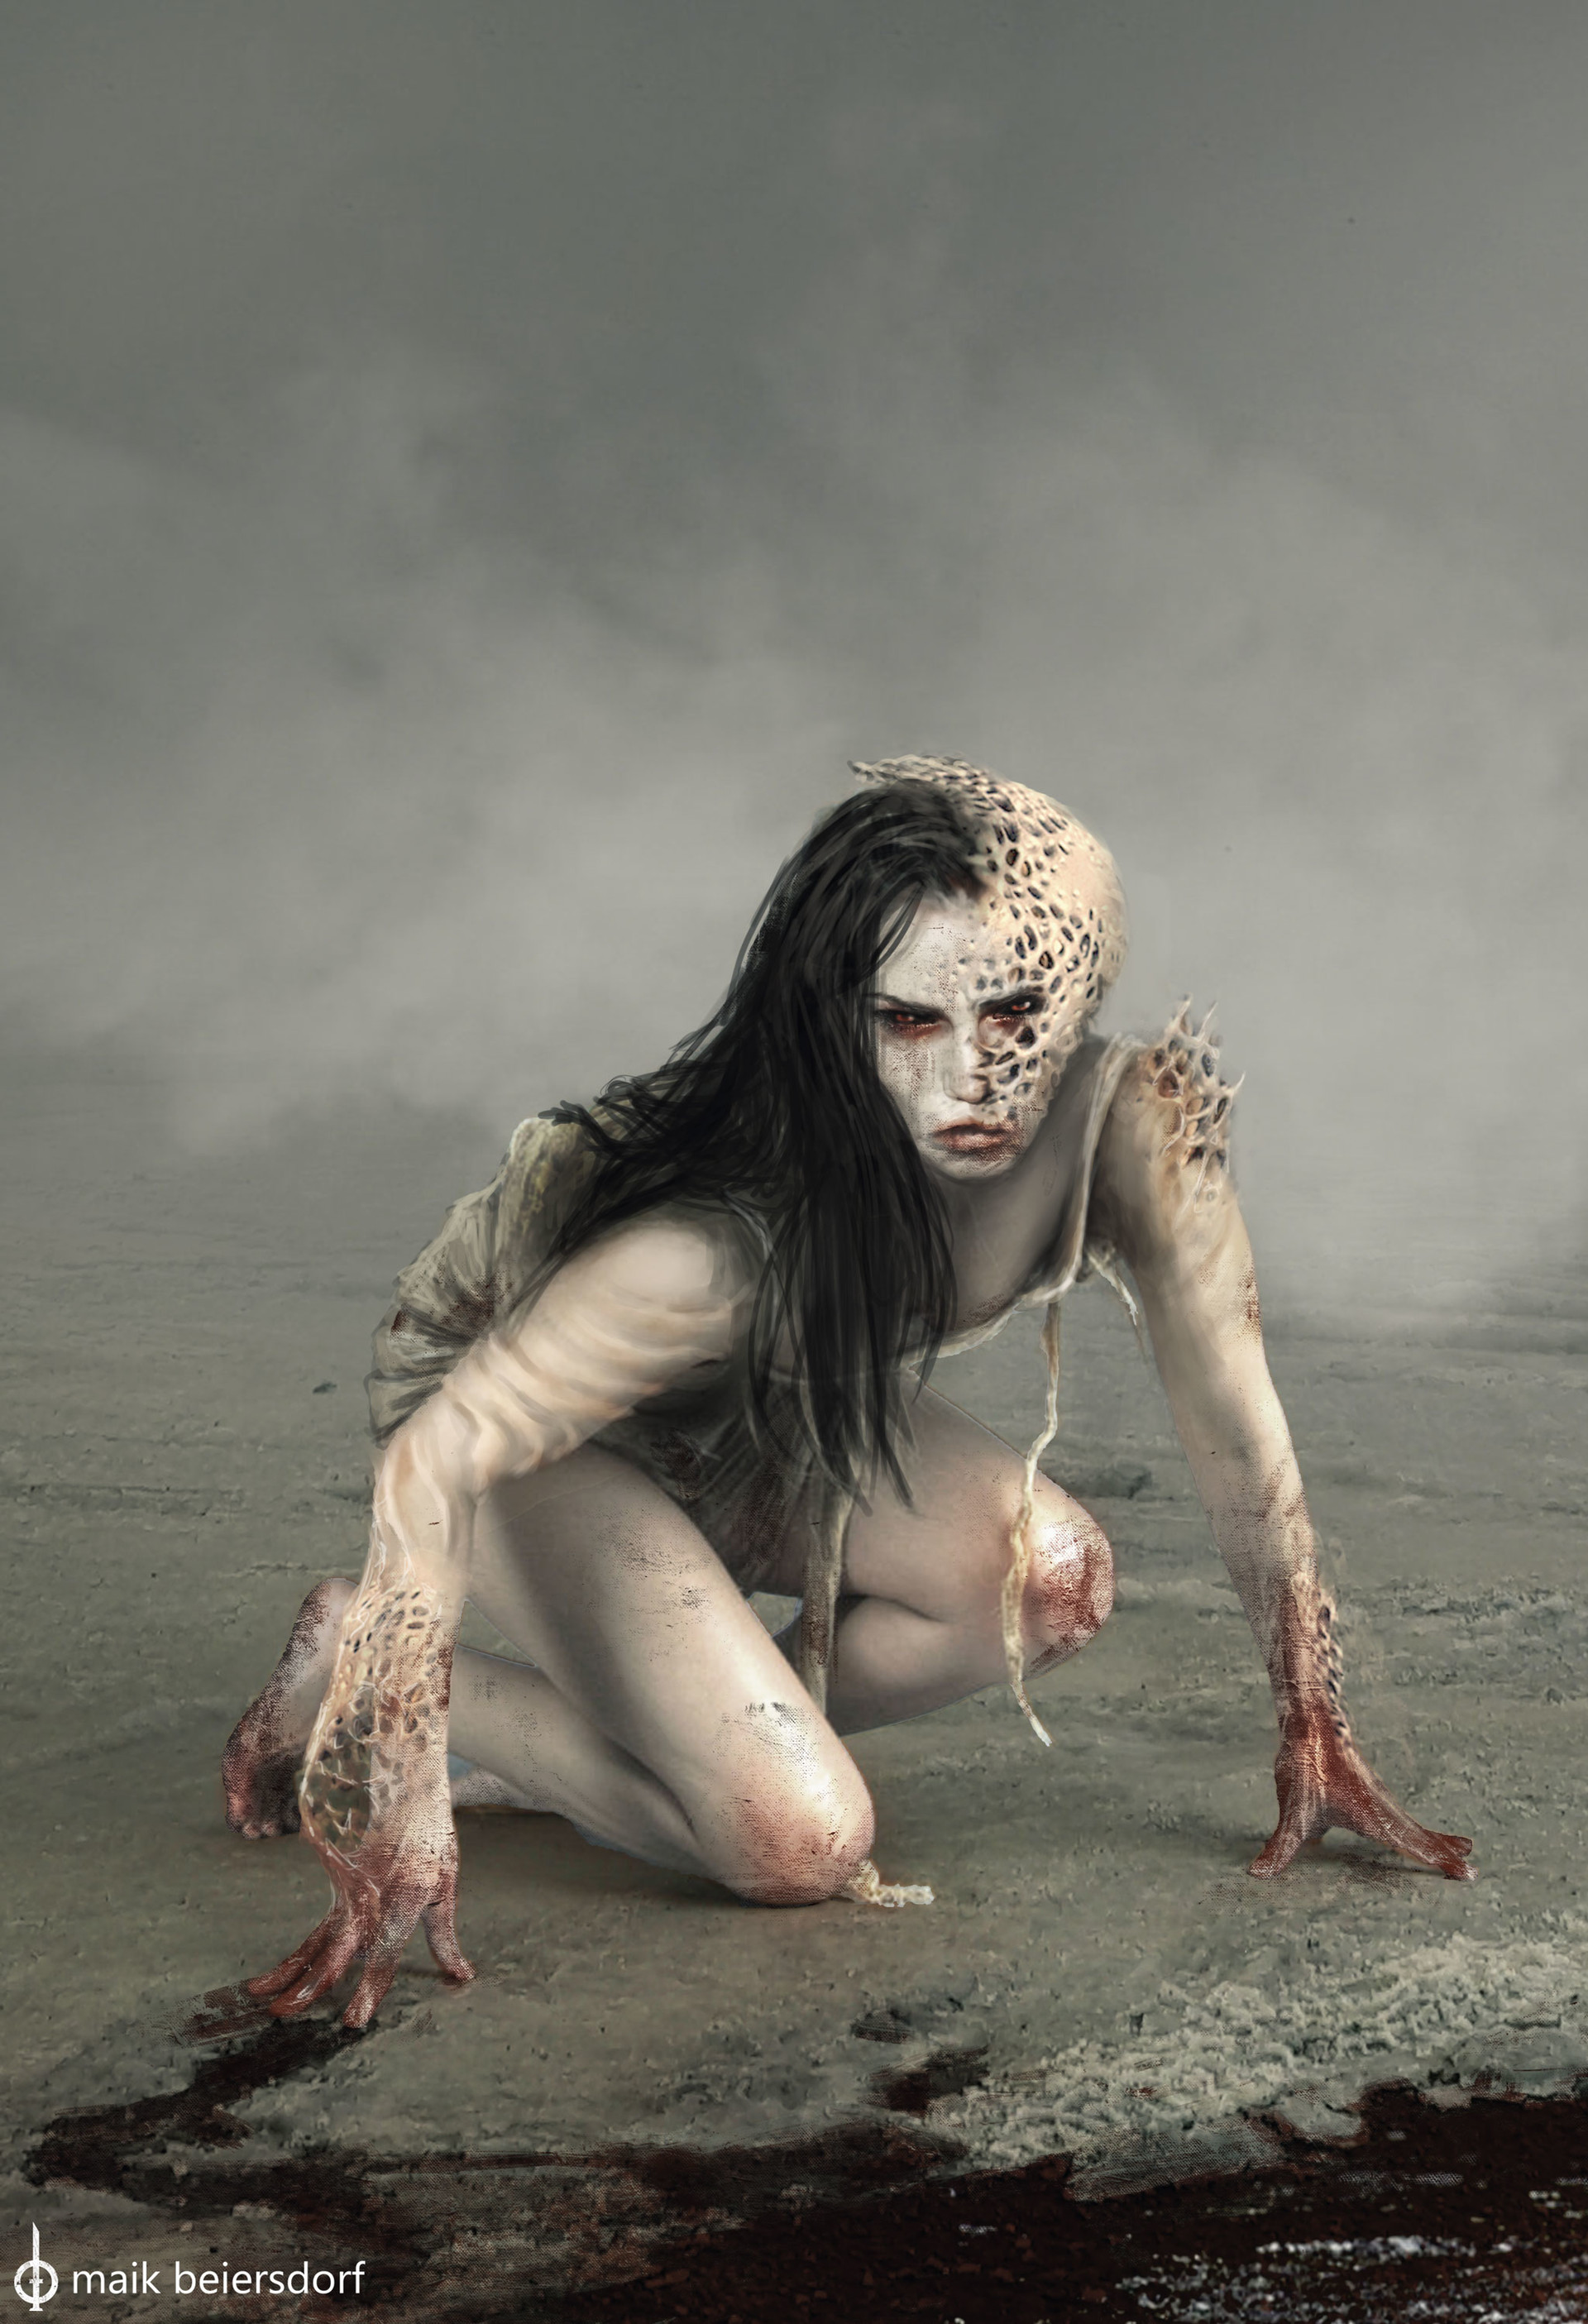 Maik beiersdorf creature 01 web